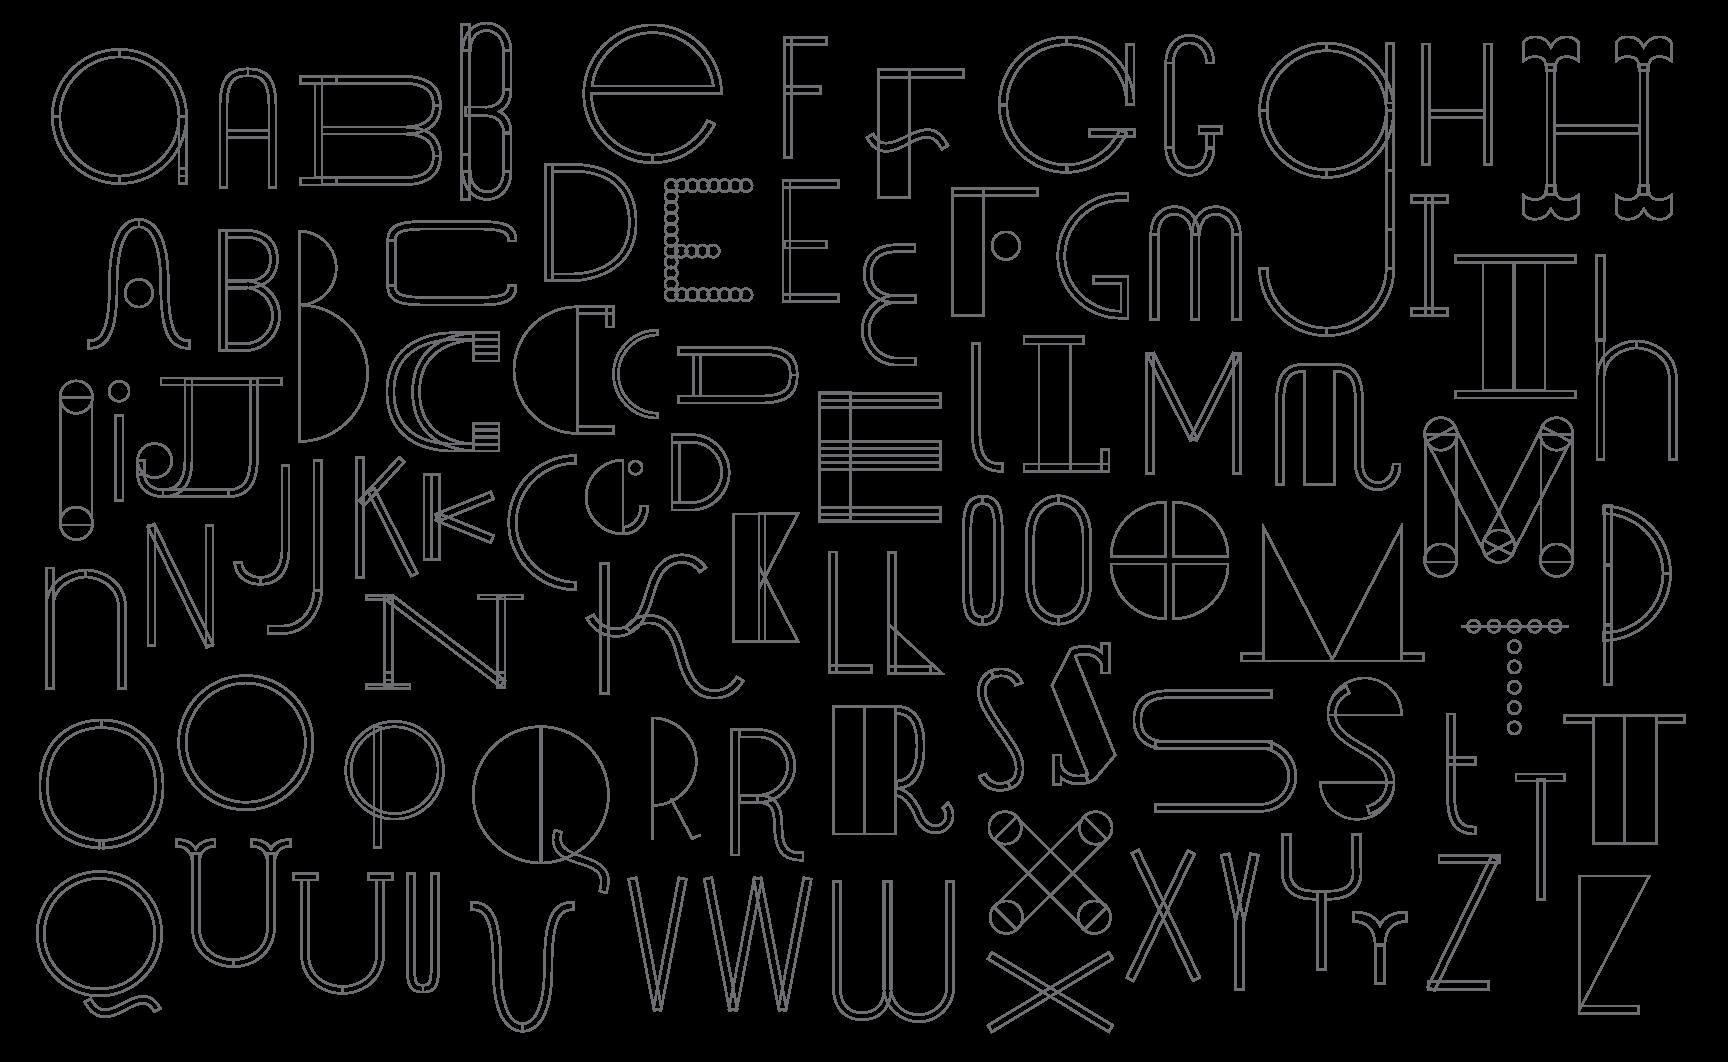 kelceytowell-lettermaker